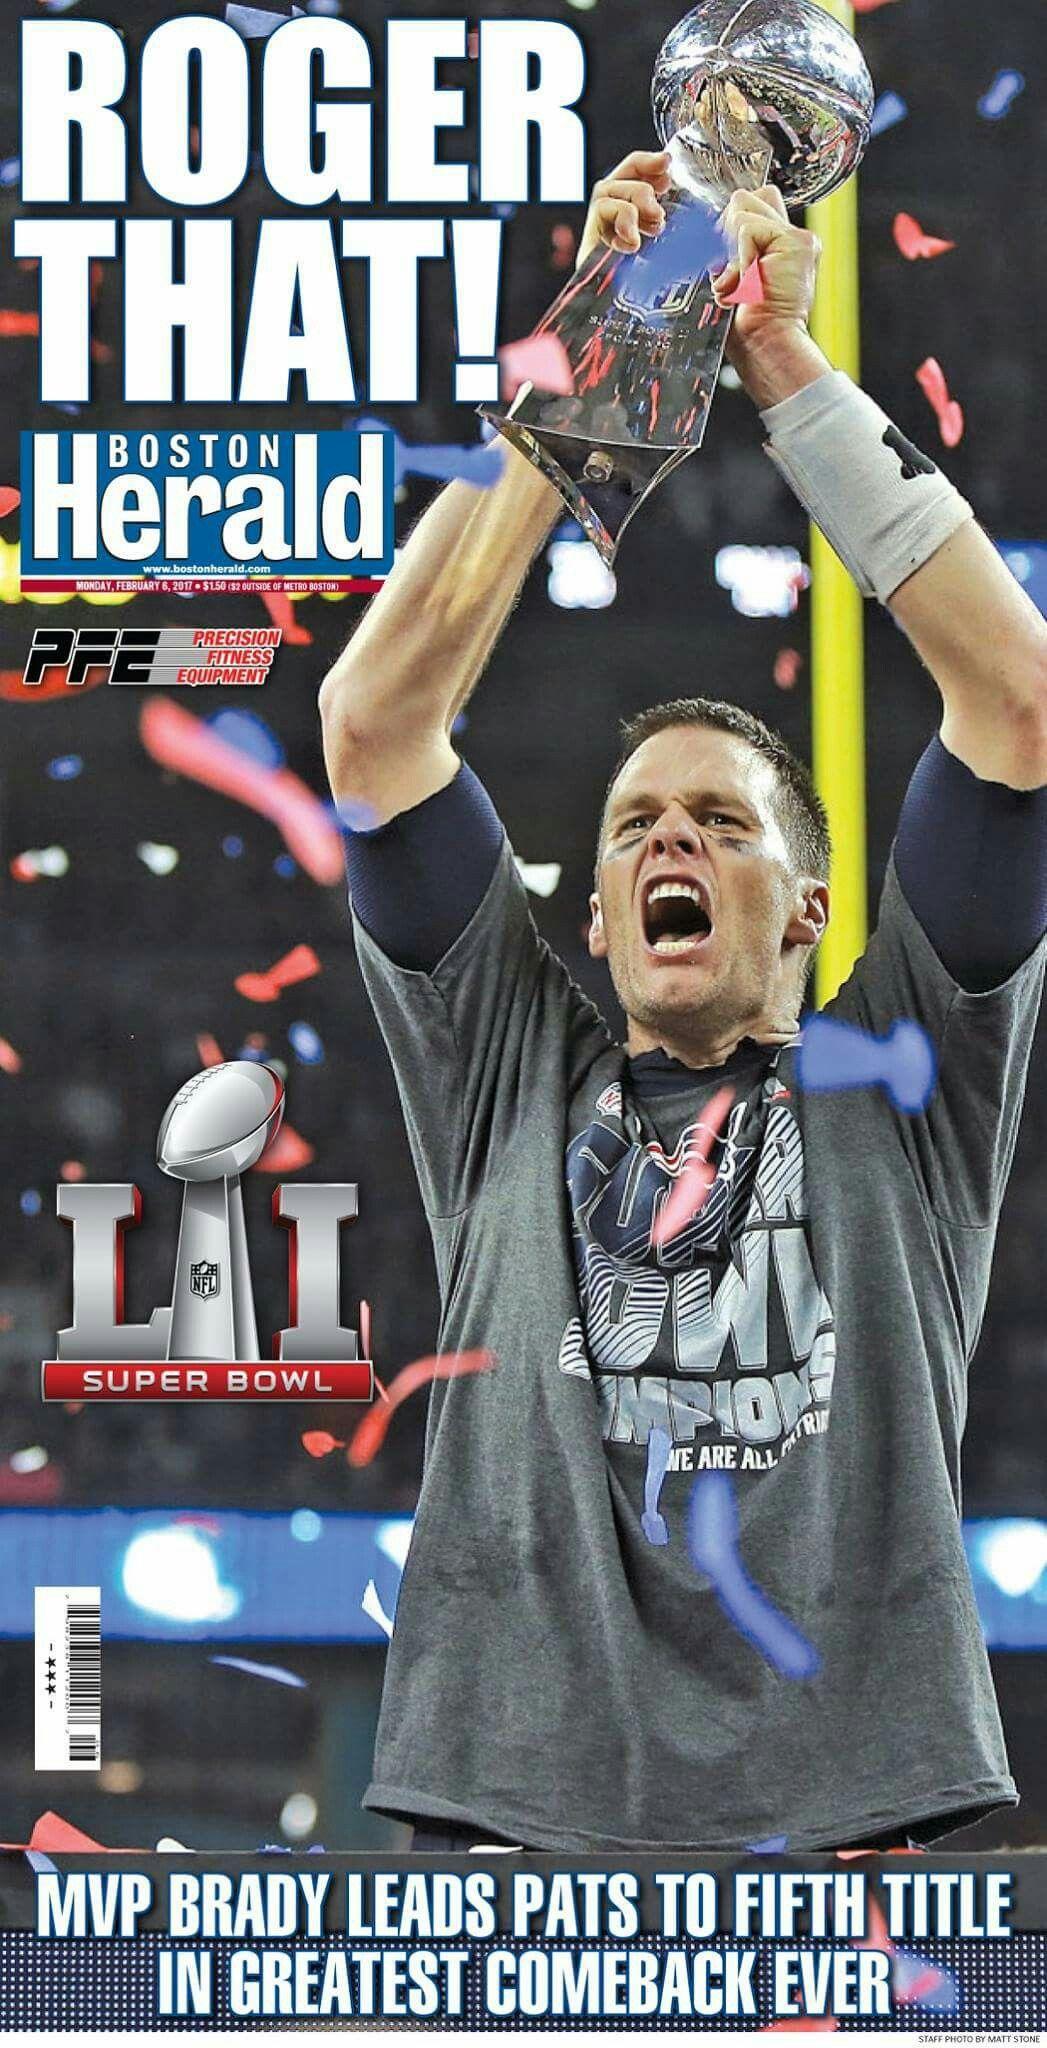 Tom Brady Go Blue New England Patriots New England Patriots Football Patriots